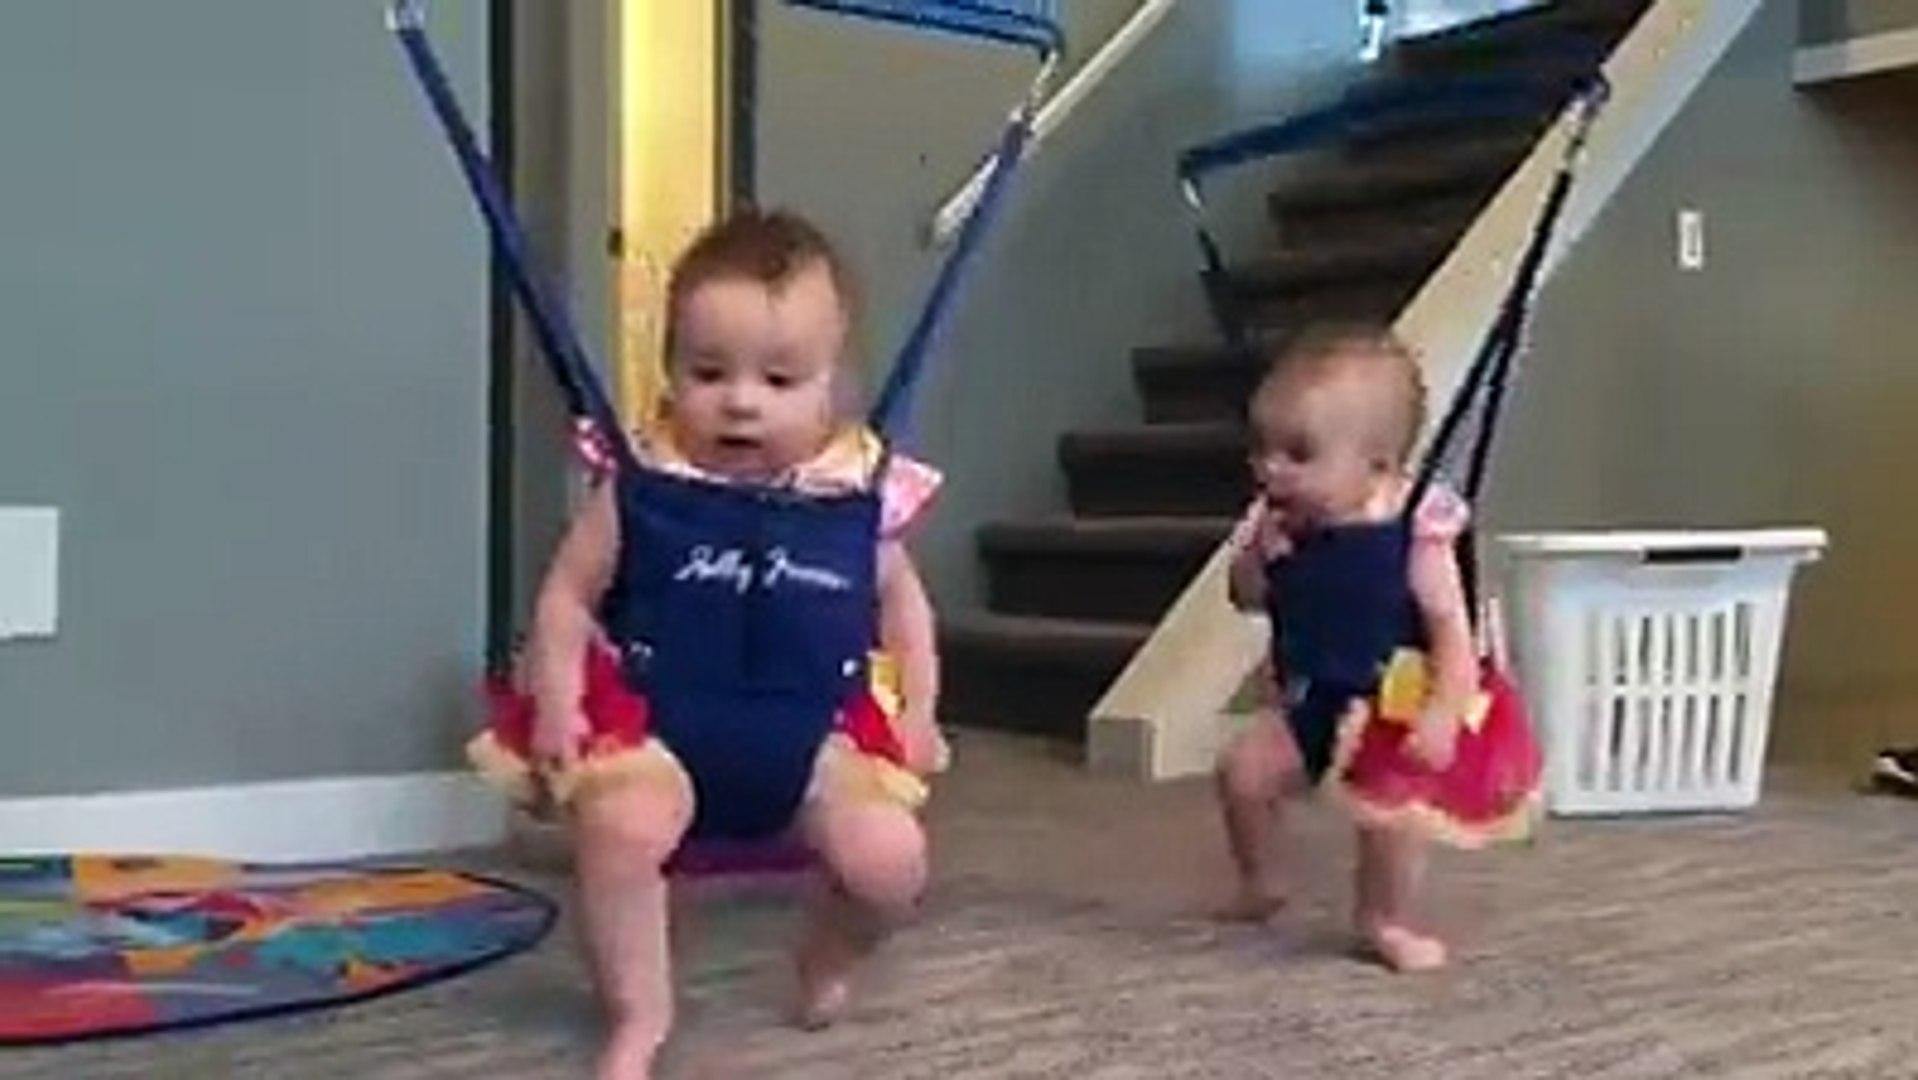 Kids playing - so cute